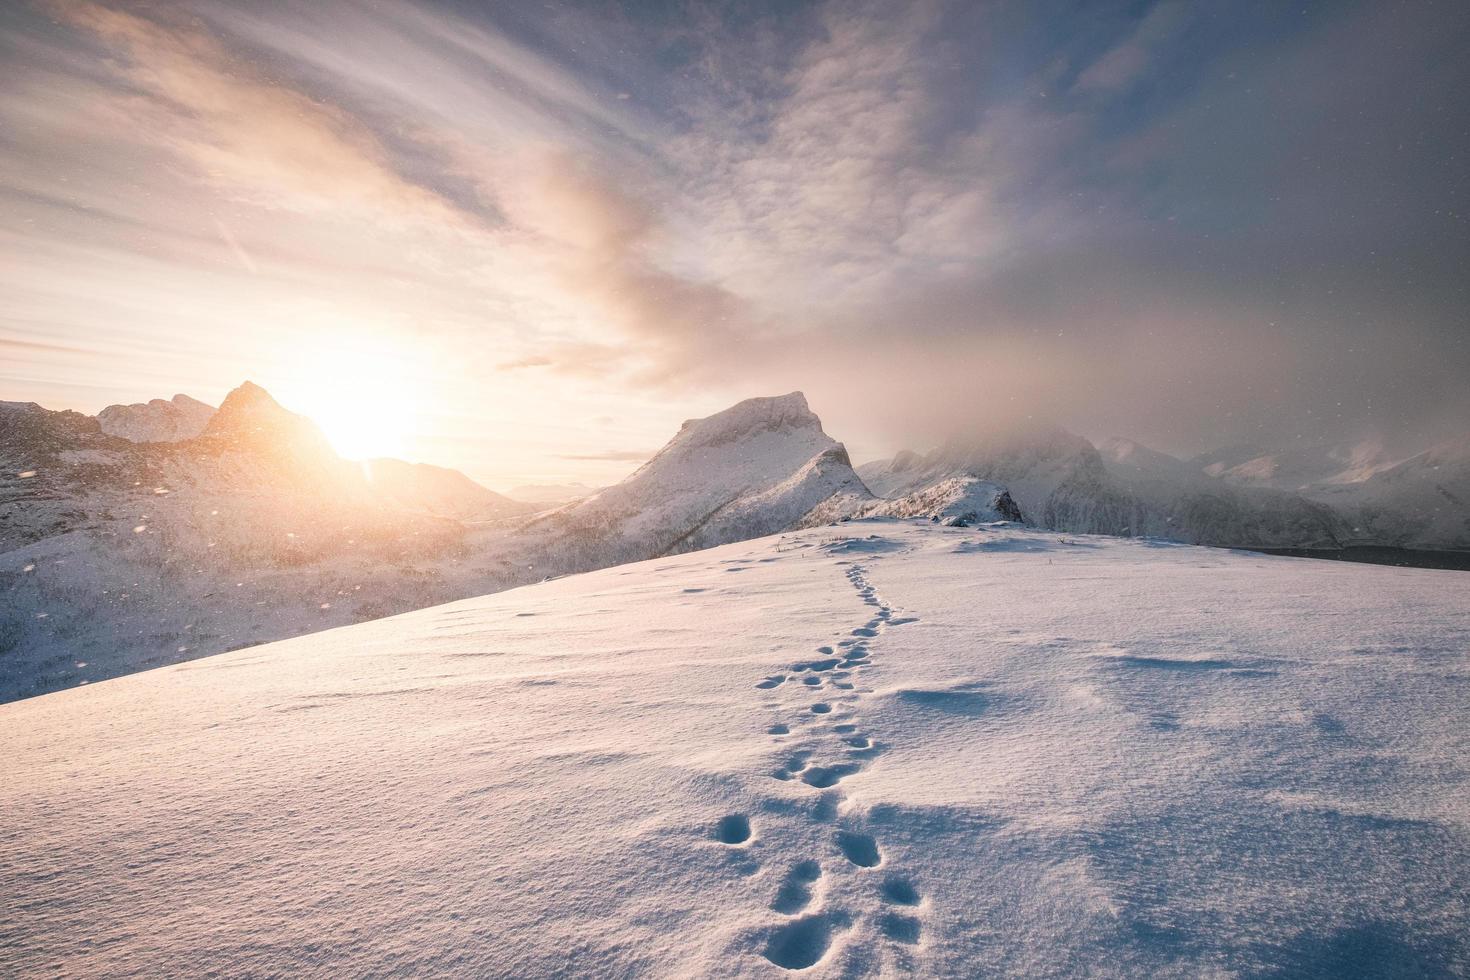 snöiga fotavtryck på bergskanten foto